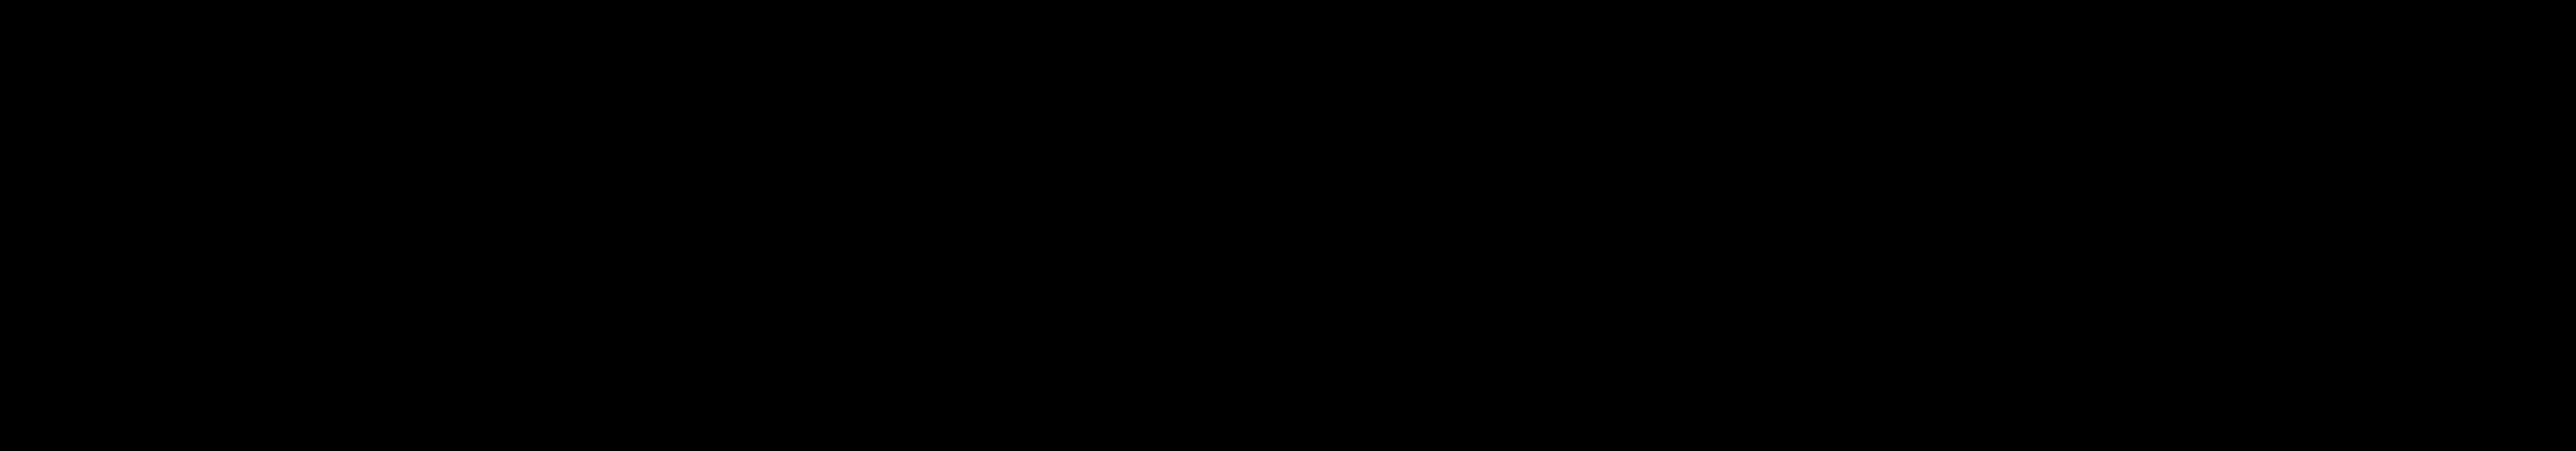 Timothy Oostendarp (signature)